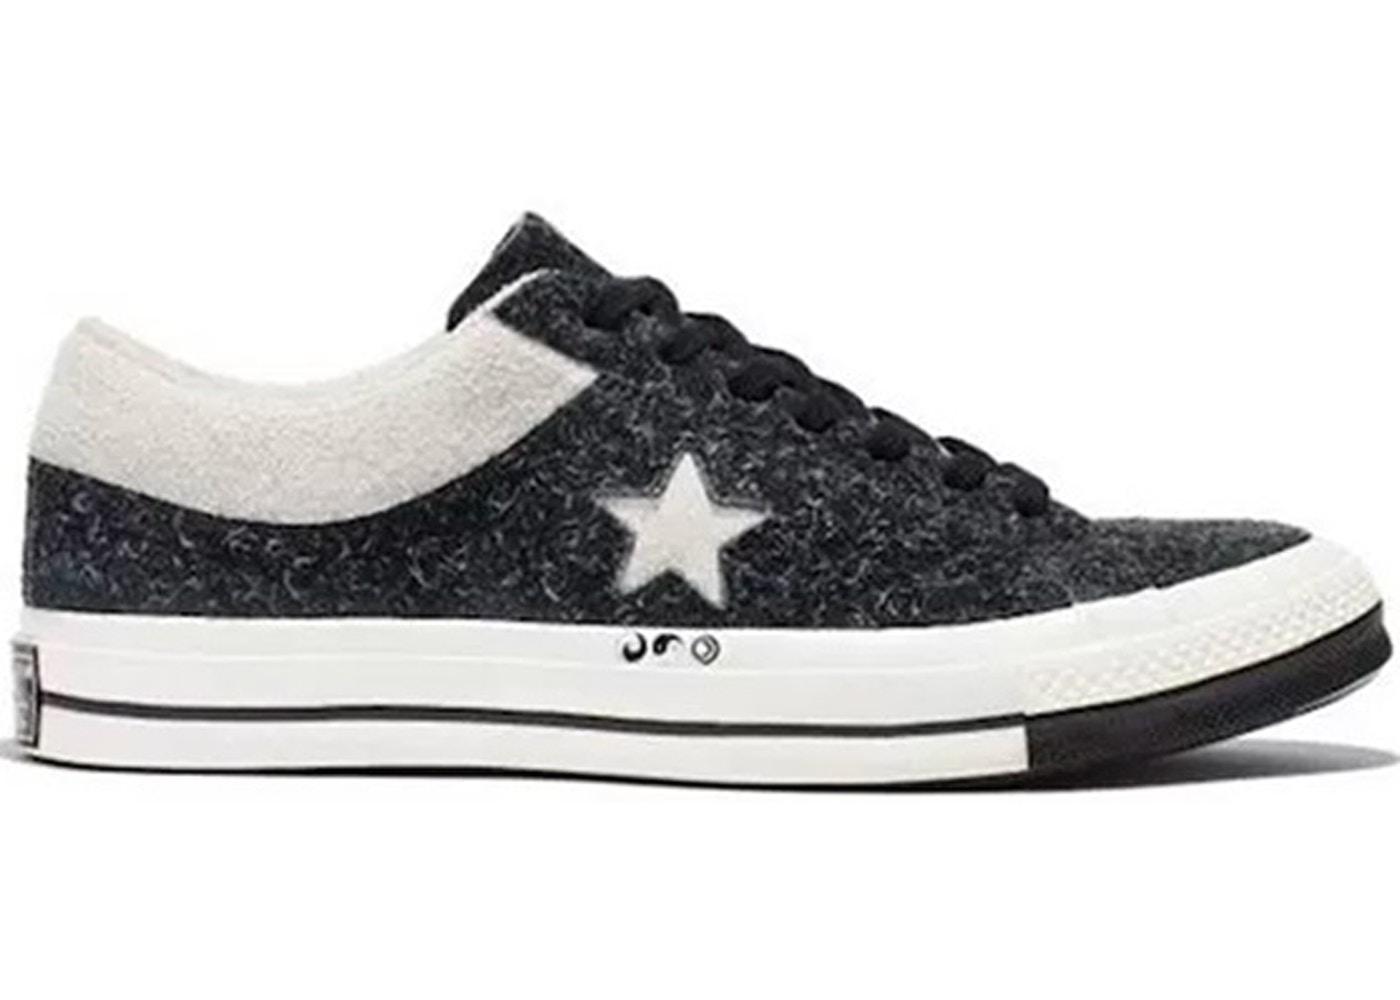 Converse One Star Ox CLOT Black White - 159248C